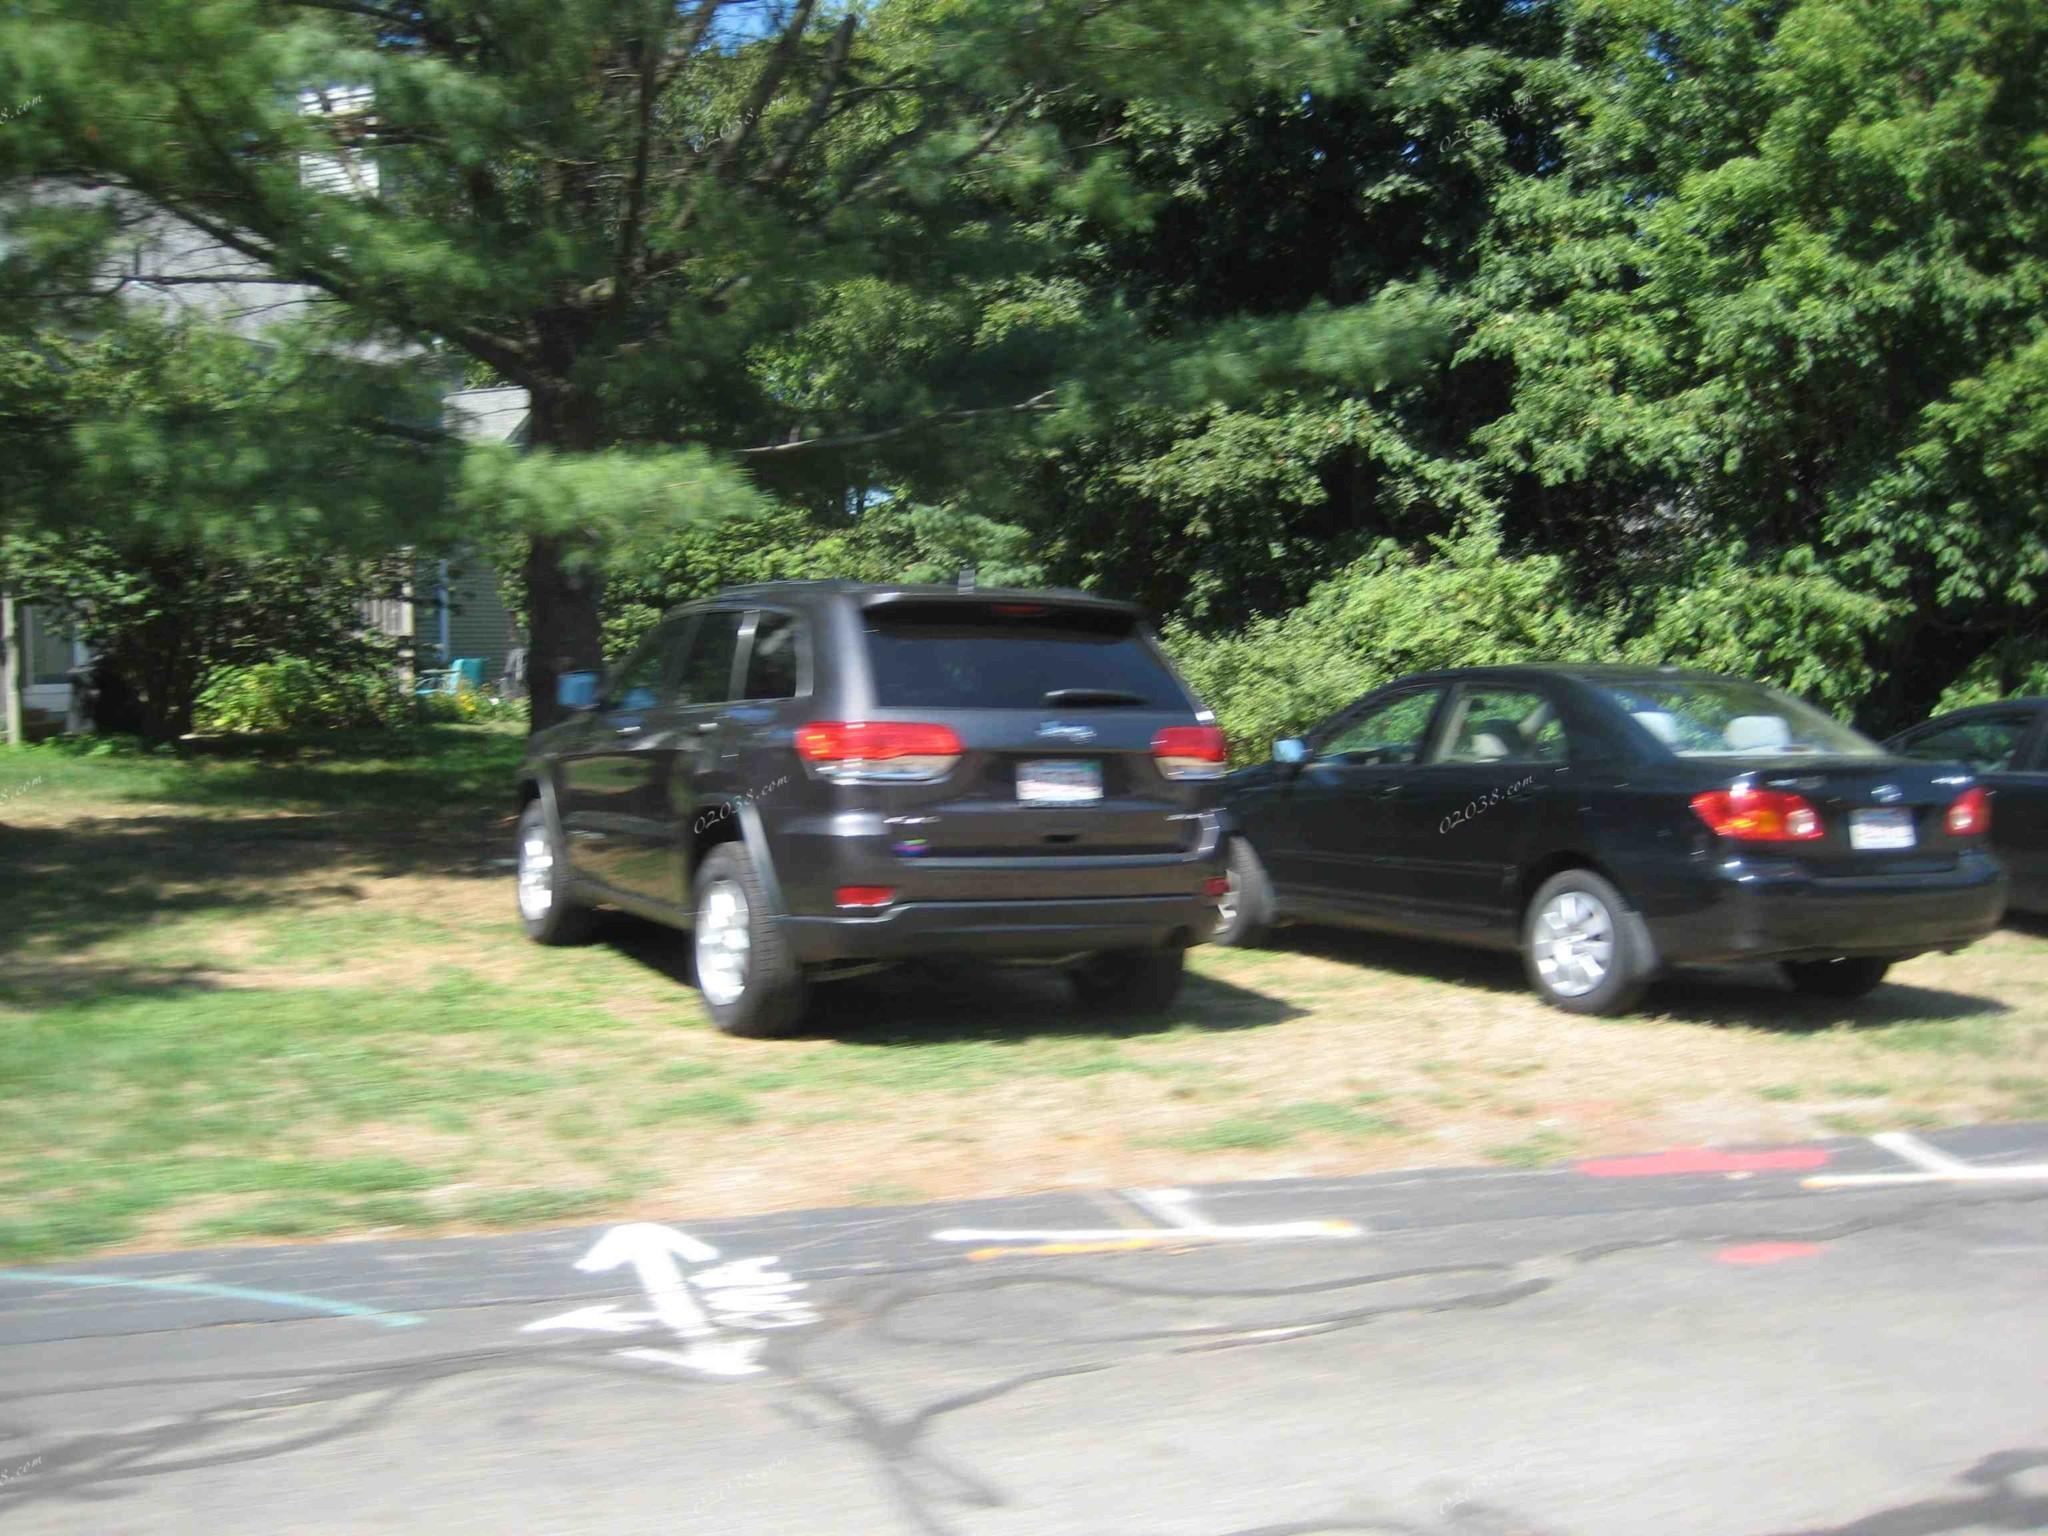 Stone Ridge Condos Franklin MA 02038 - temporary parking